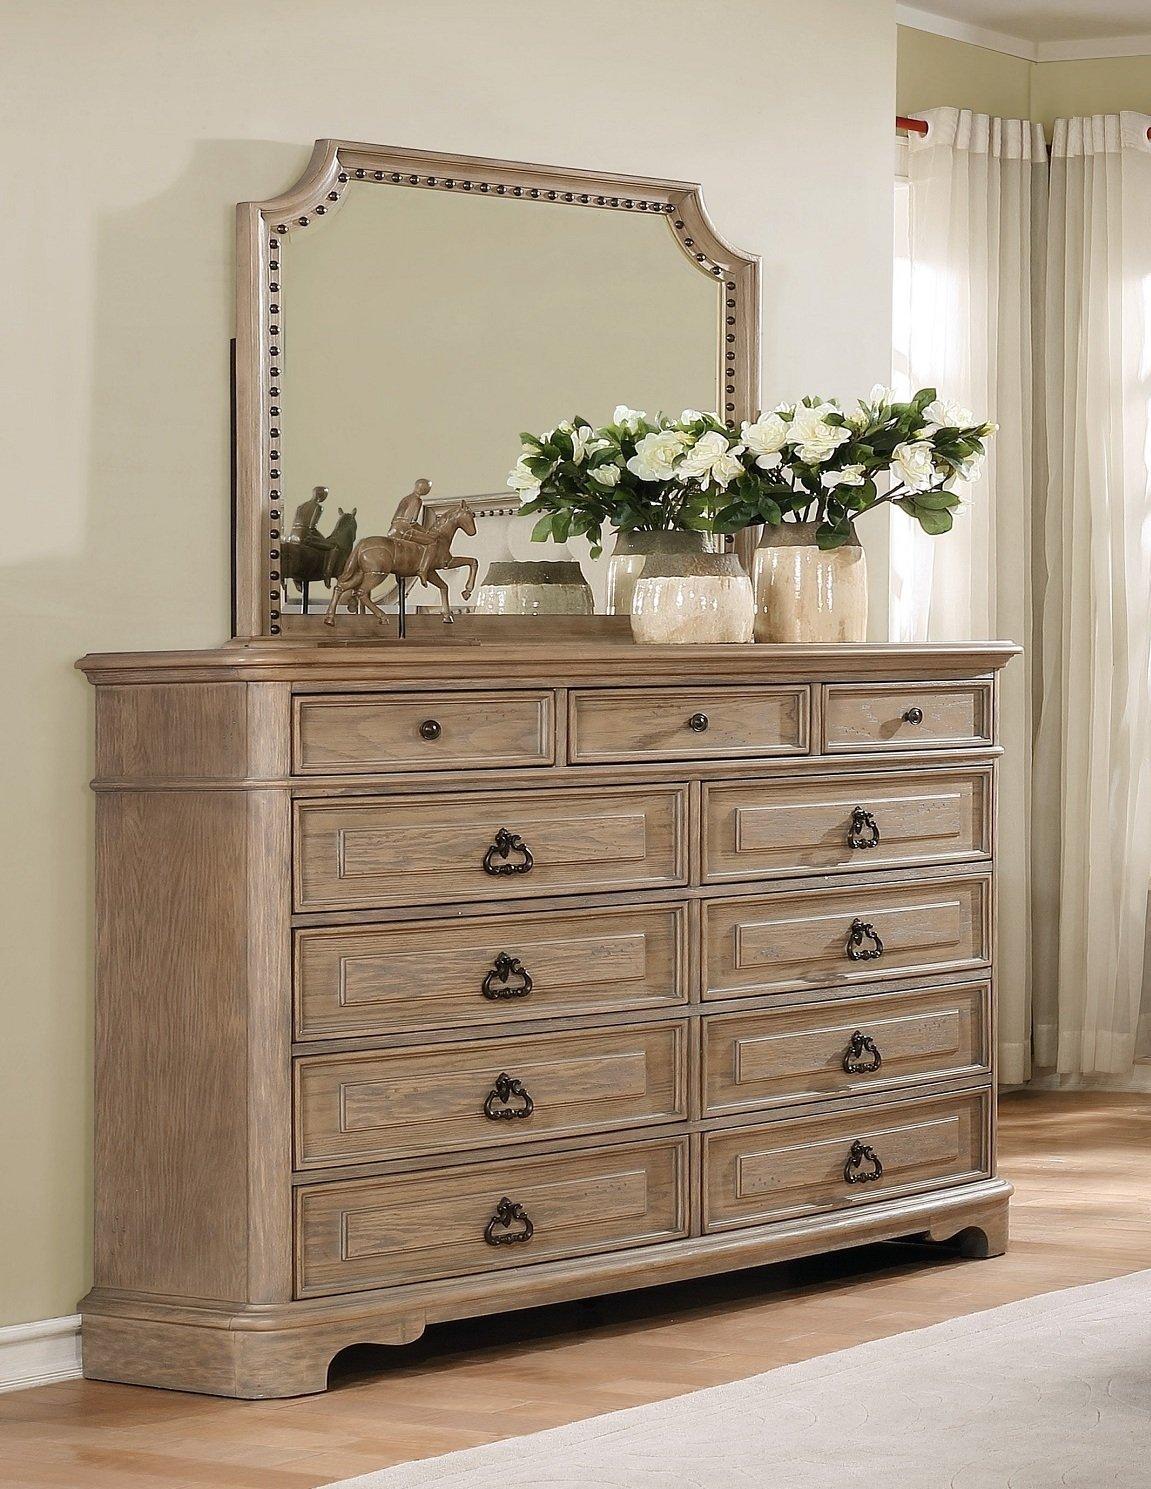 Roundhill Furniture B296DM Piraeus 296 11 Drawers White Wash Dresser and Nailhead Trim Mirror